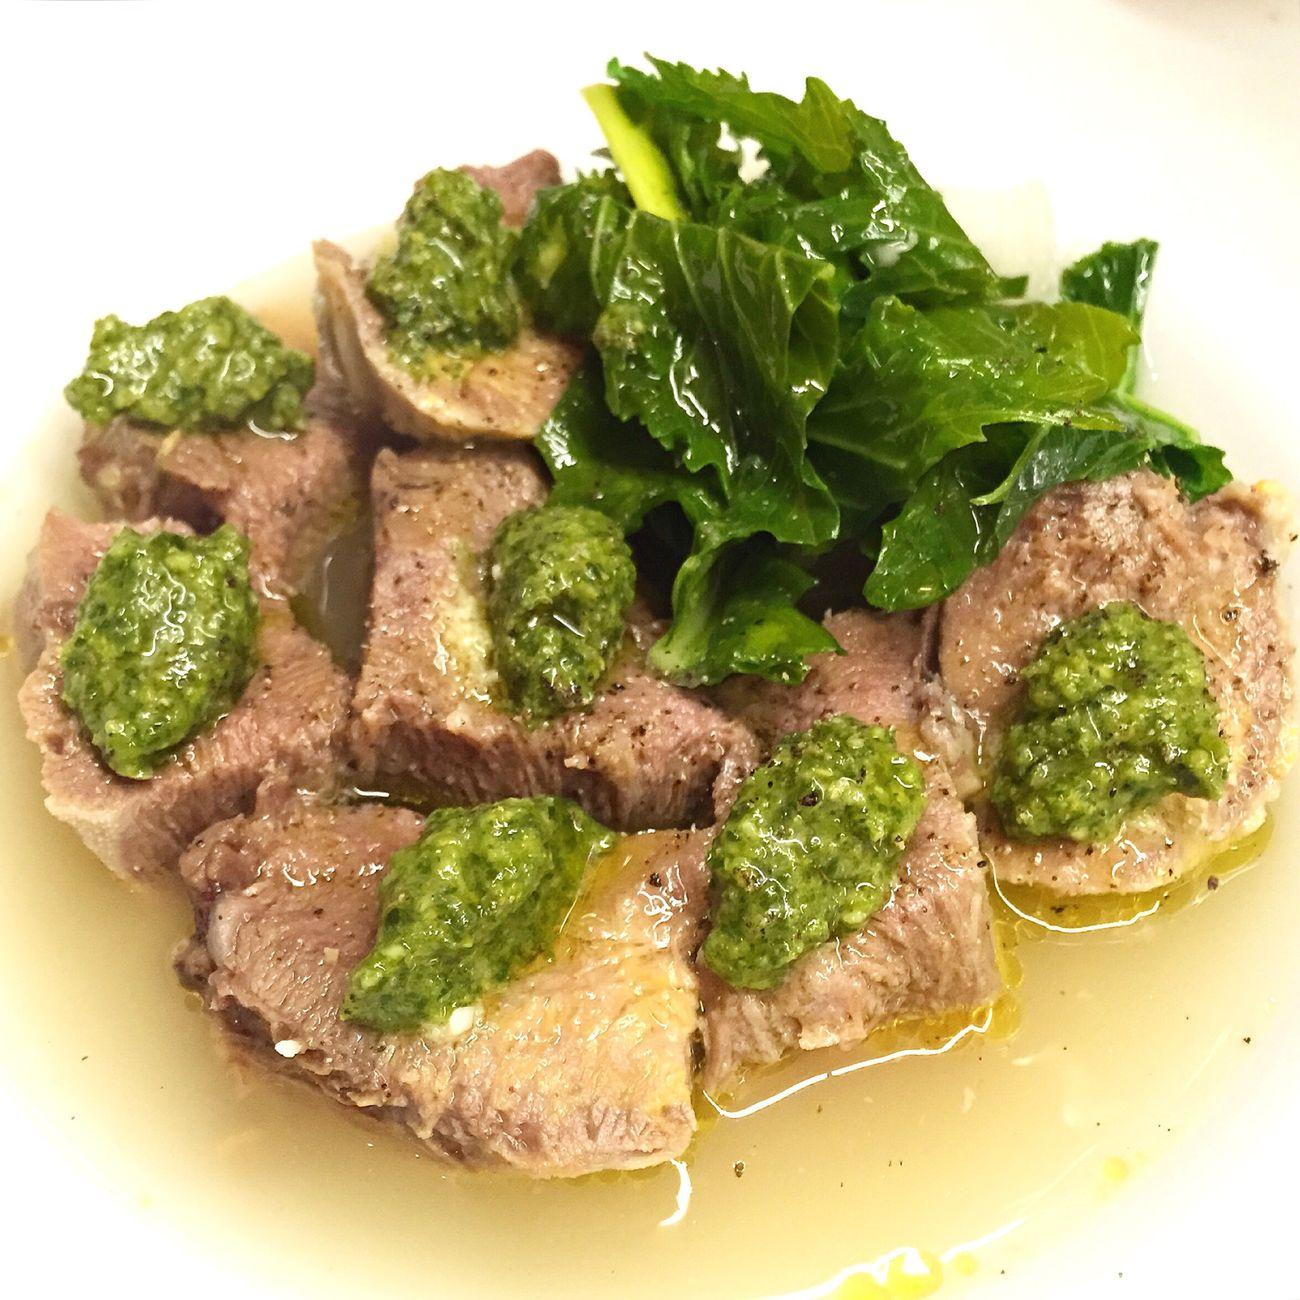 牛・タン・牛・タン・牛・タン・タン♪ Italian